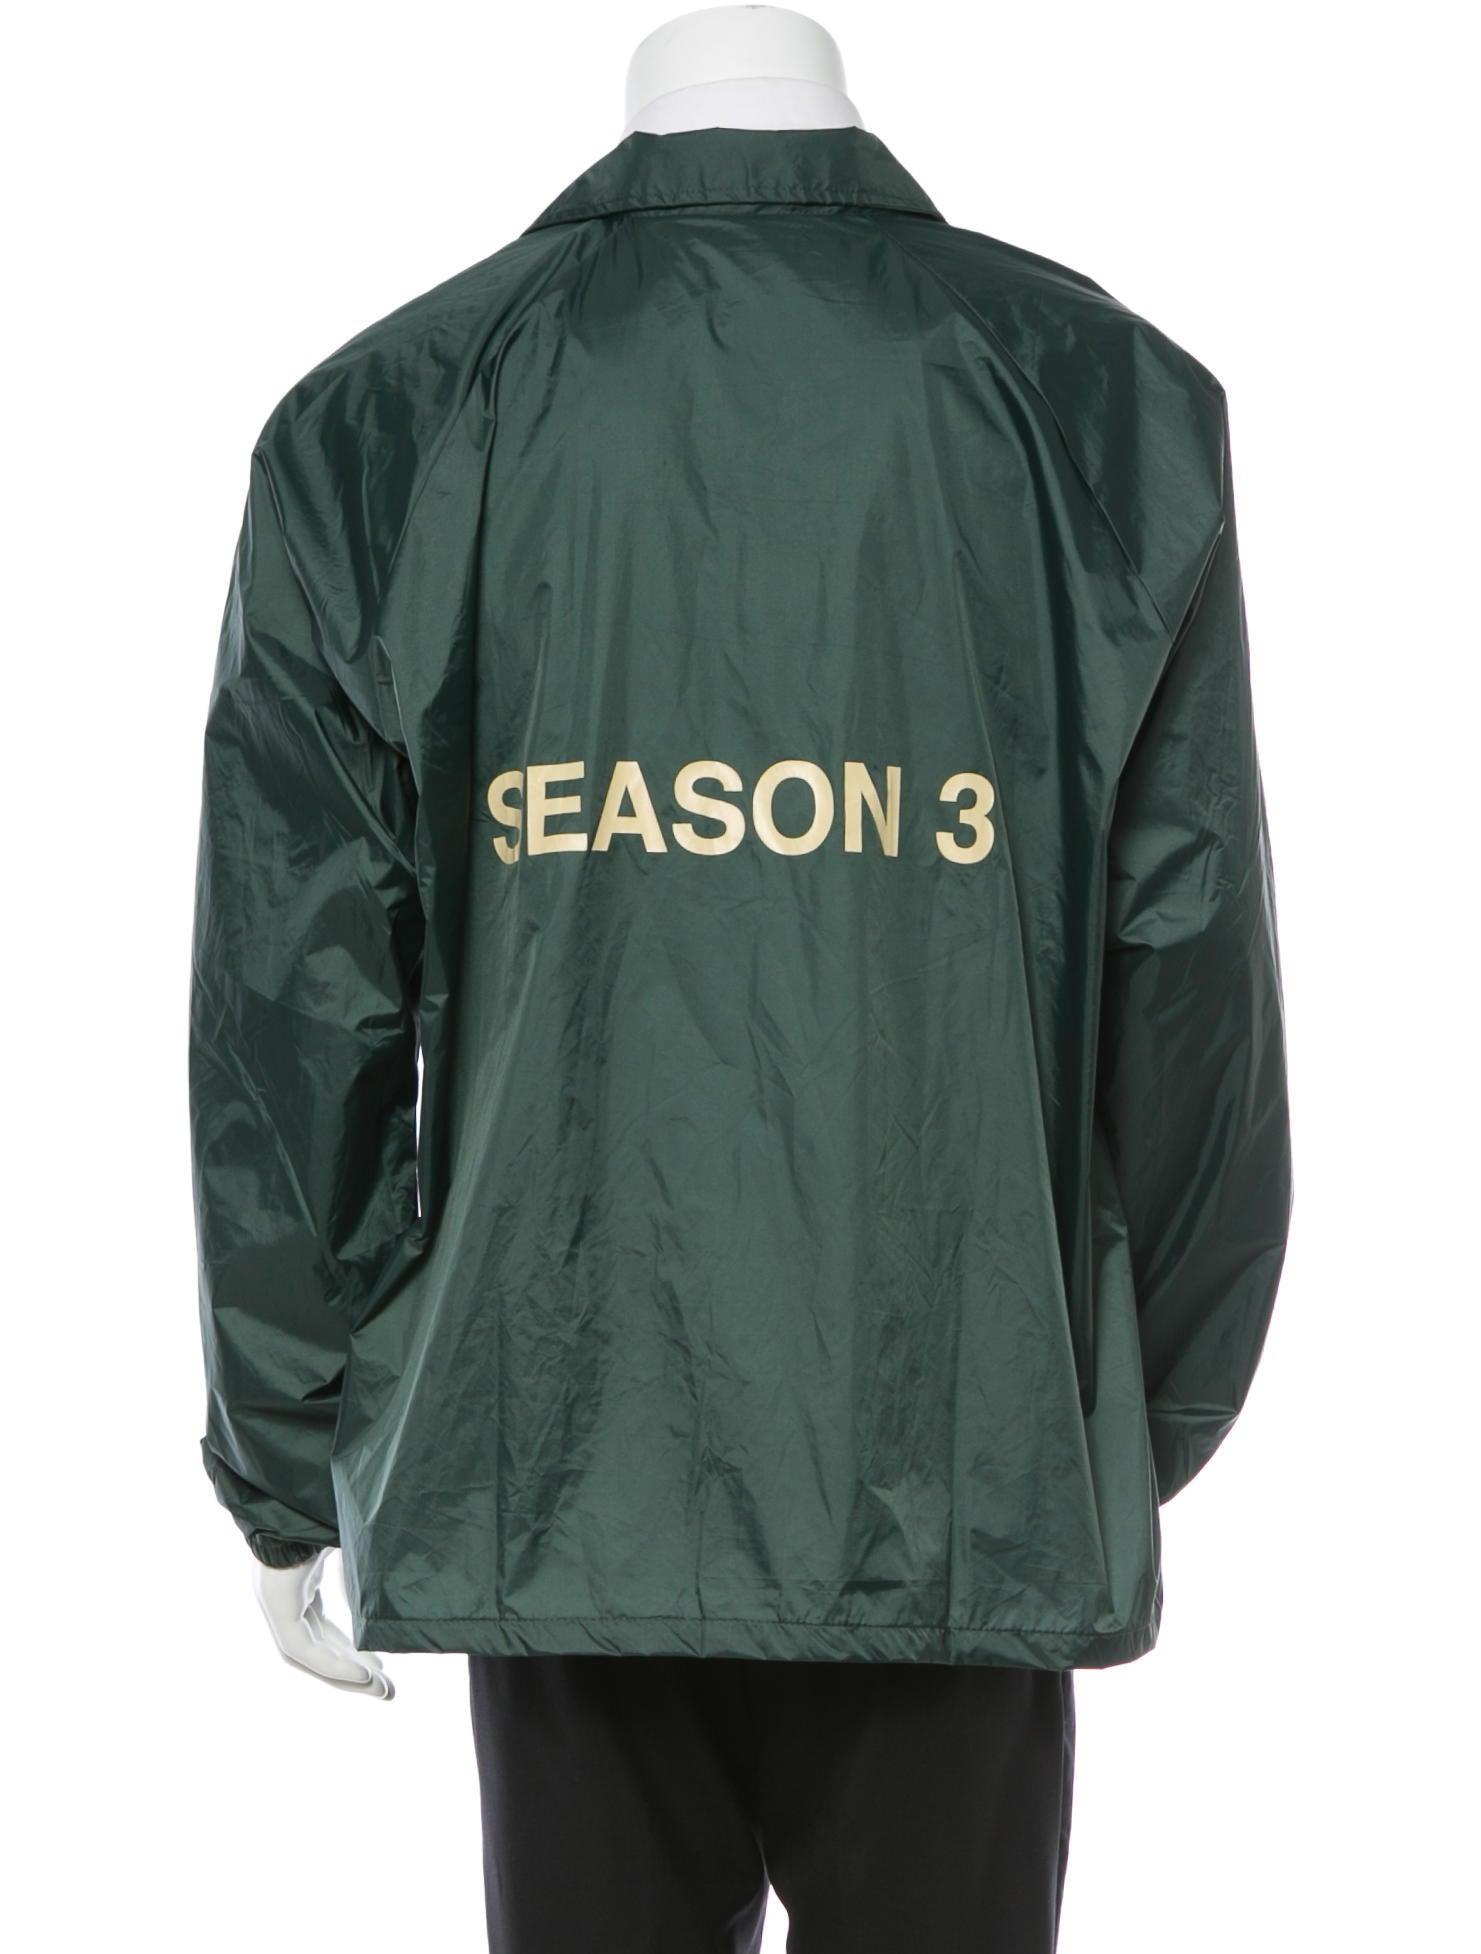 yeezy season 3 invitation coaches jacket w tags. Black Bedroom Furniture Sets. Home Design Ideas